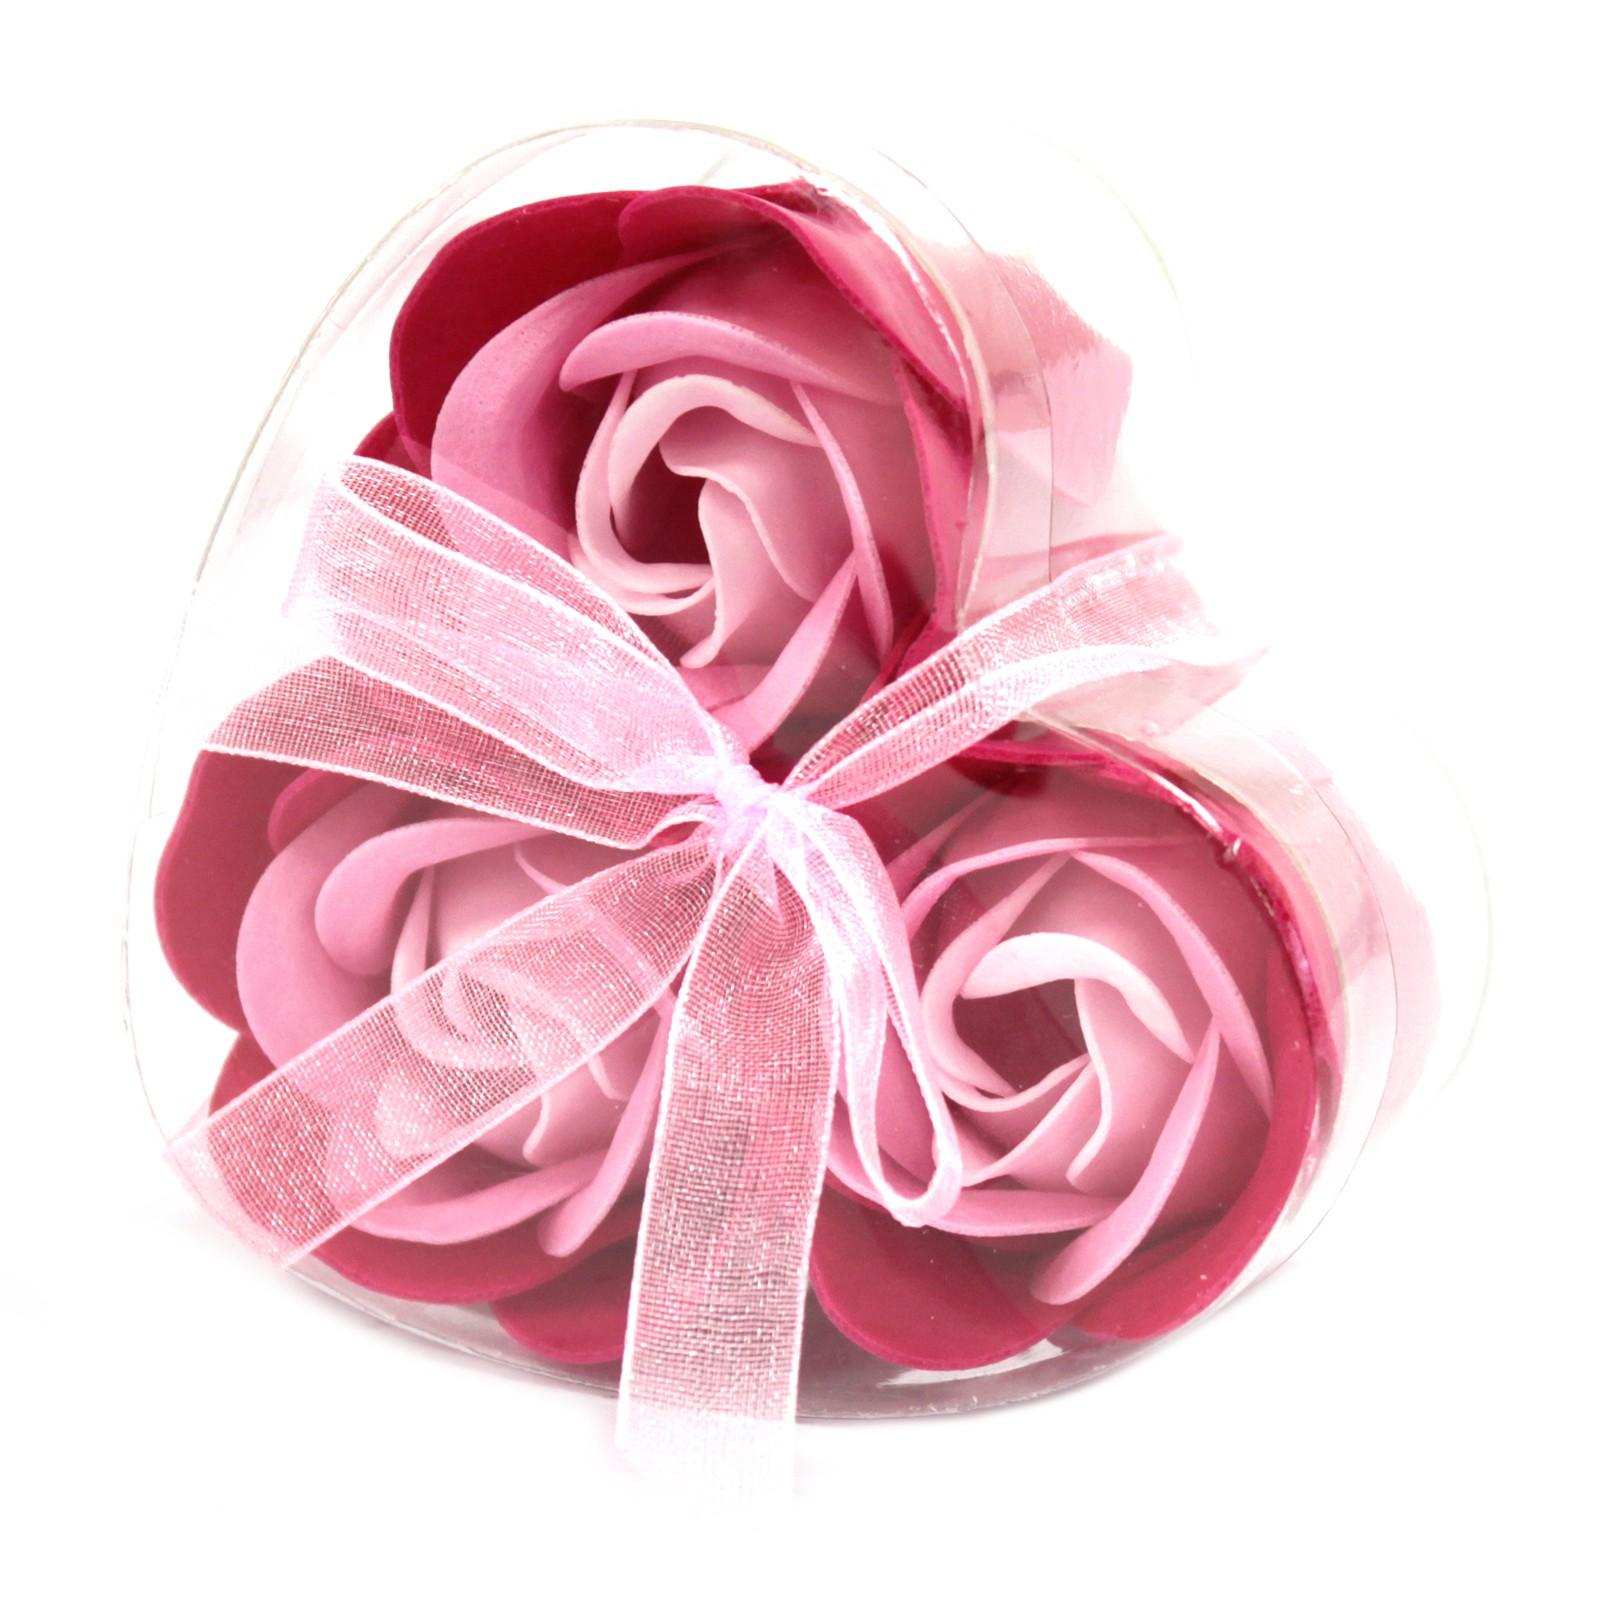 Set of 3 Soap Flower Heart Box Pink Roses